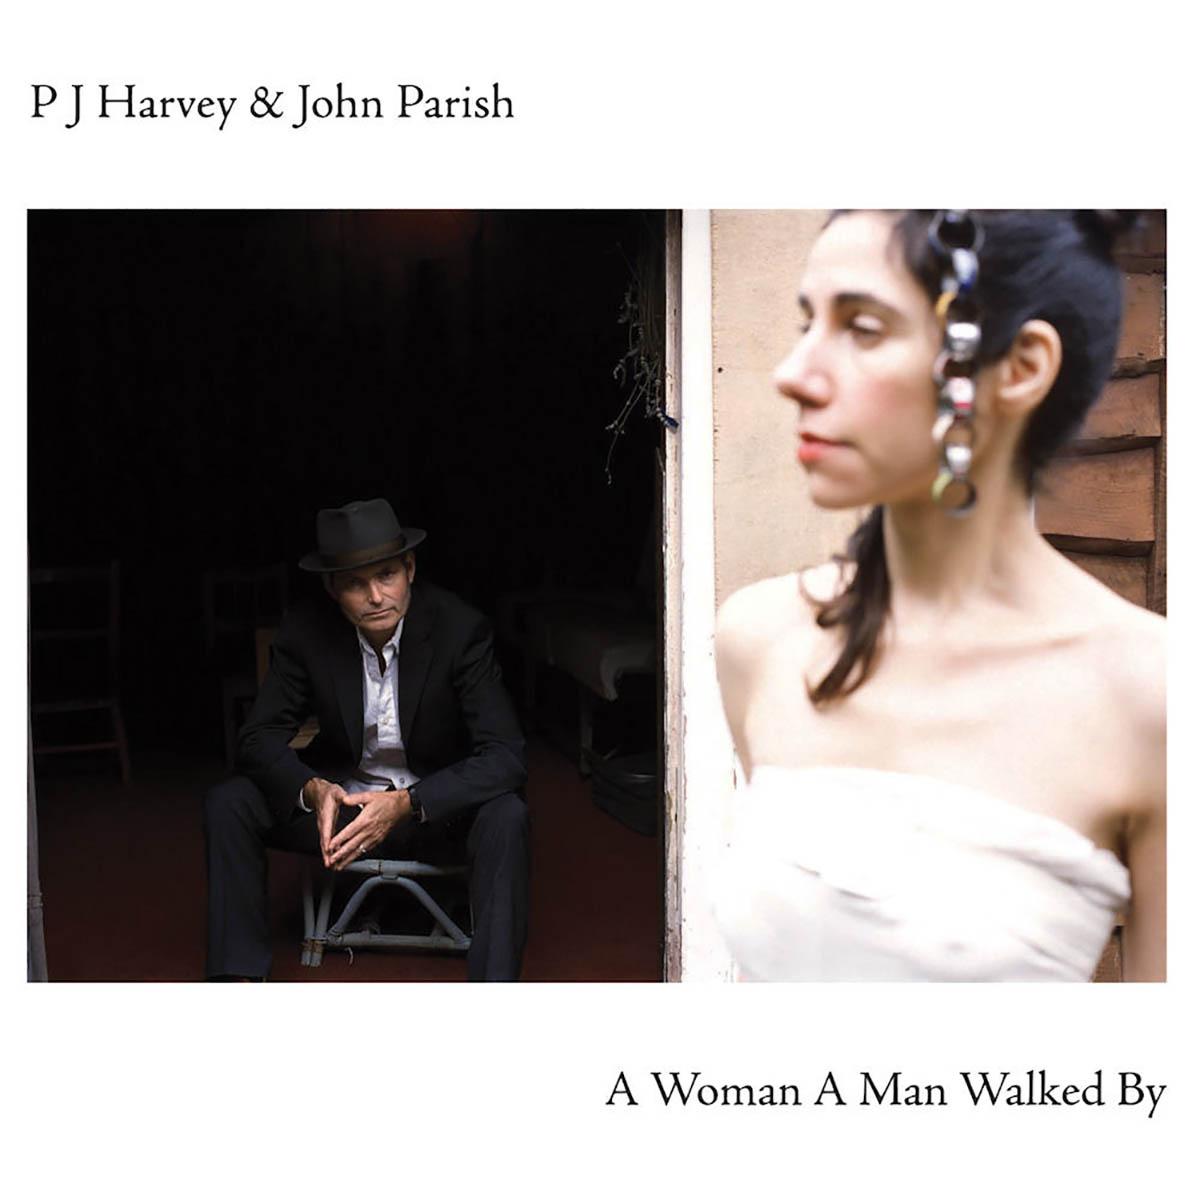 PJ Harvey & John Parish, A Woman a Man Walked By